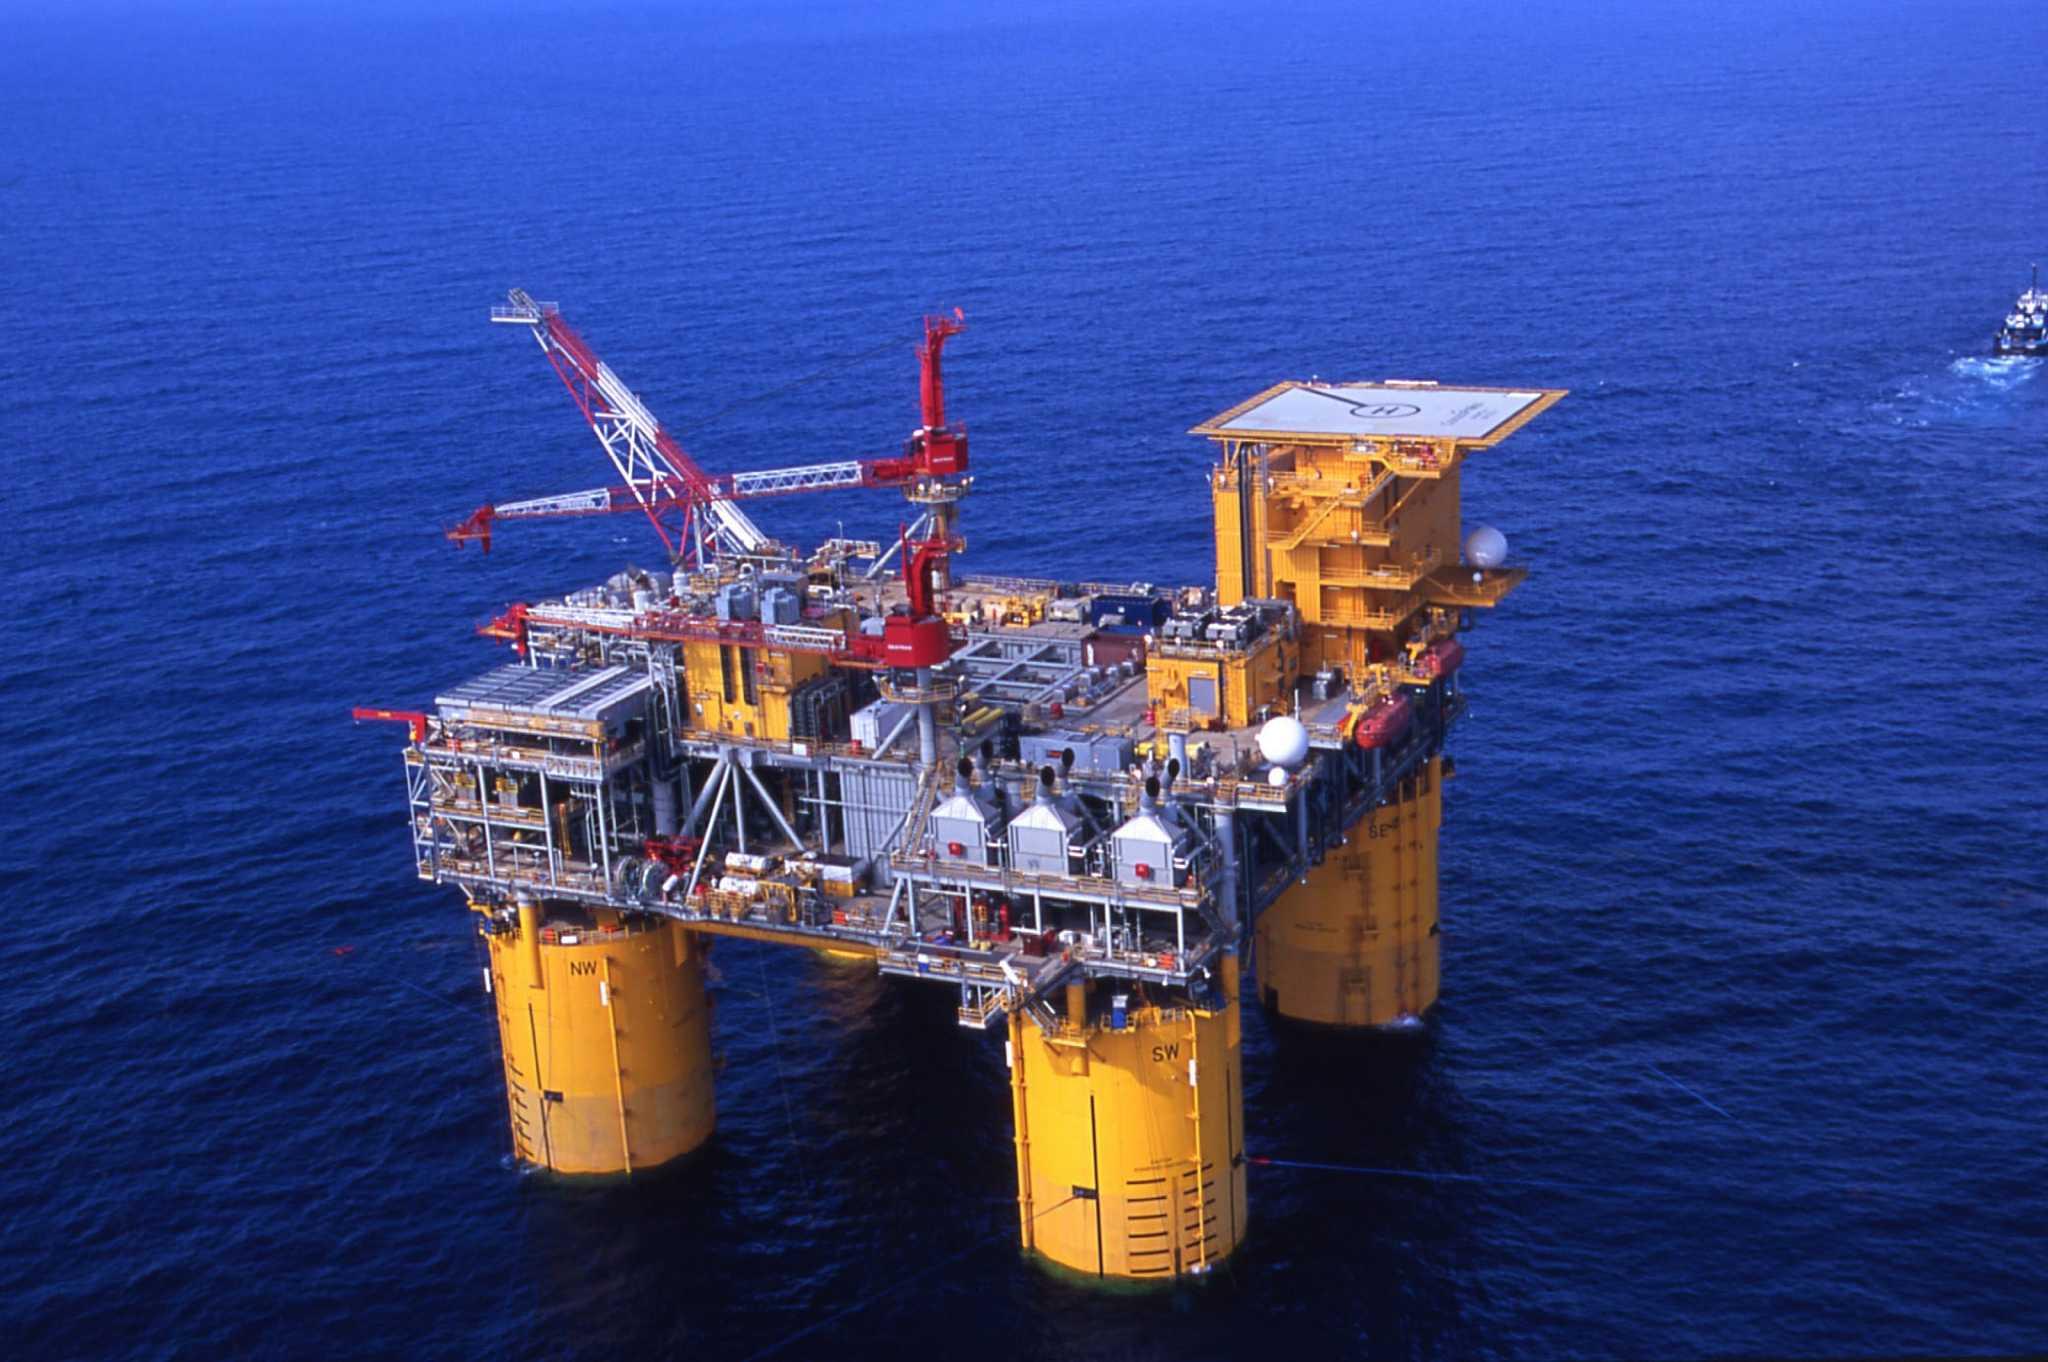 Oil drilling essay essay enduring love nature Texas oil platform